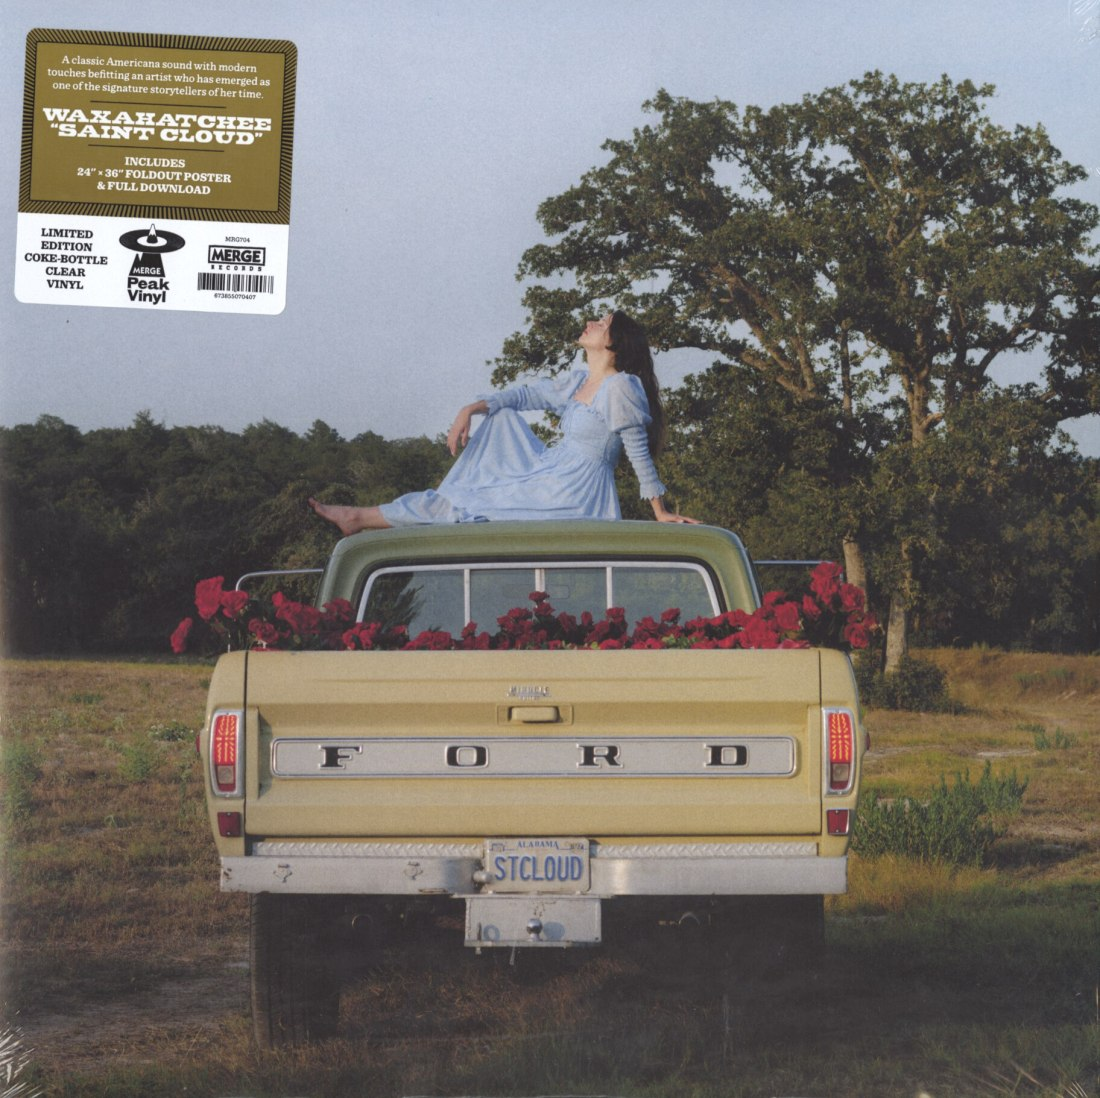 Waxahatchee - Saint Cloud - Ltd Ed, Coke-bottle Clear Vinyl, LP, Merge Records, 2020